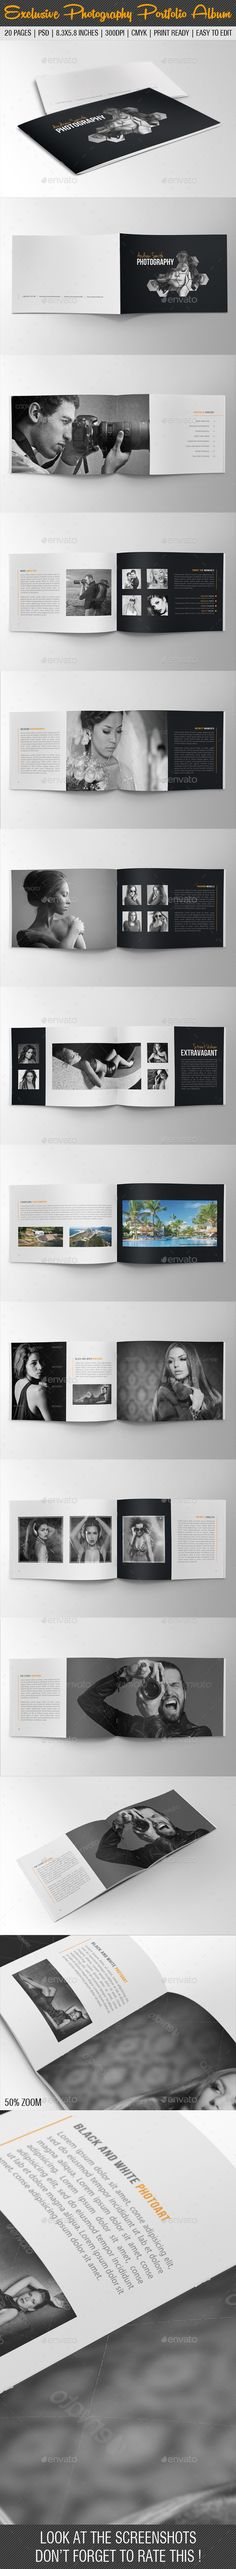 Exclusive Photography Portfolio Album 06 - #Photo #Albums Print Templates Download here: https://graphicriver.net/item/exclusive-photography-portfolio-album-06/9084738?ref=alena994